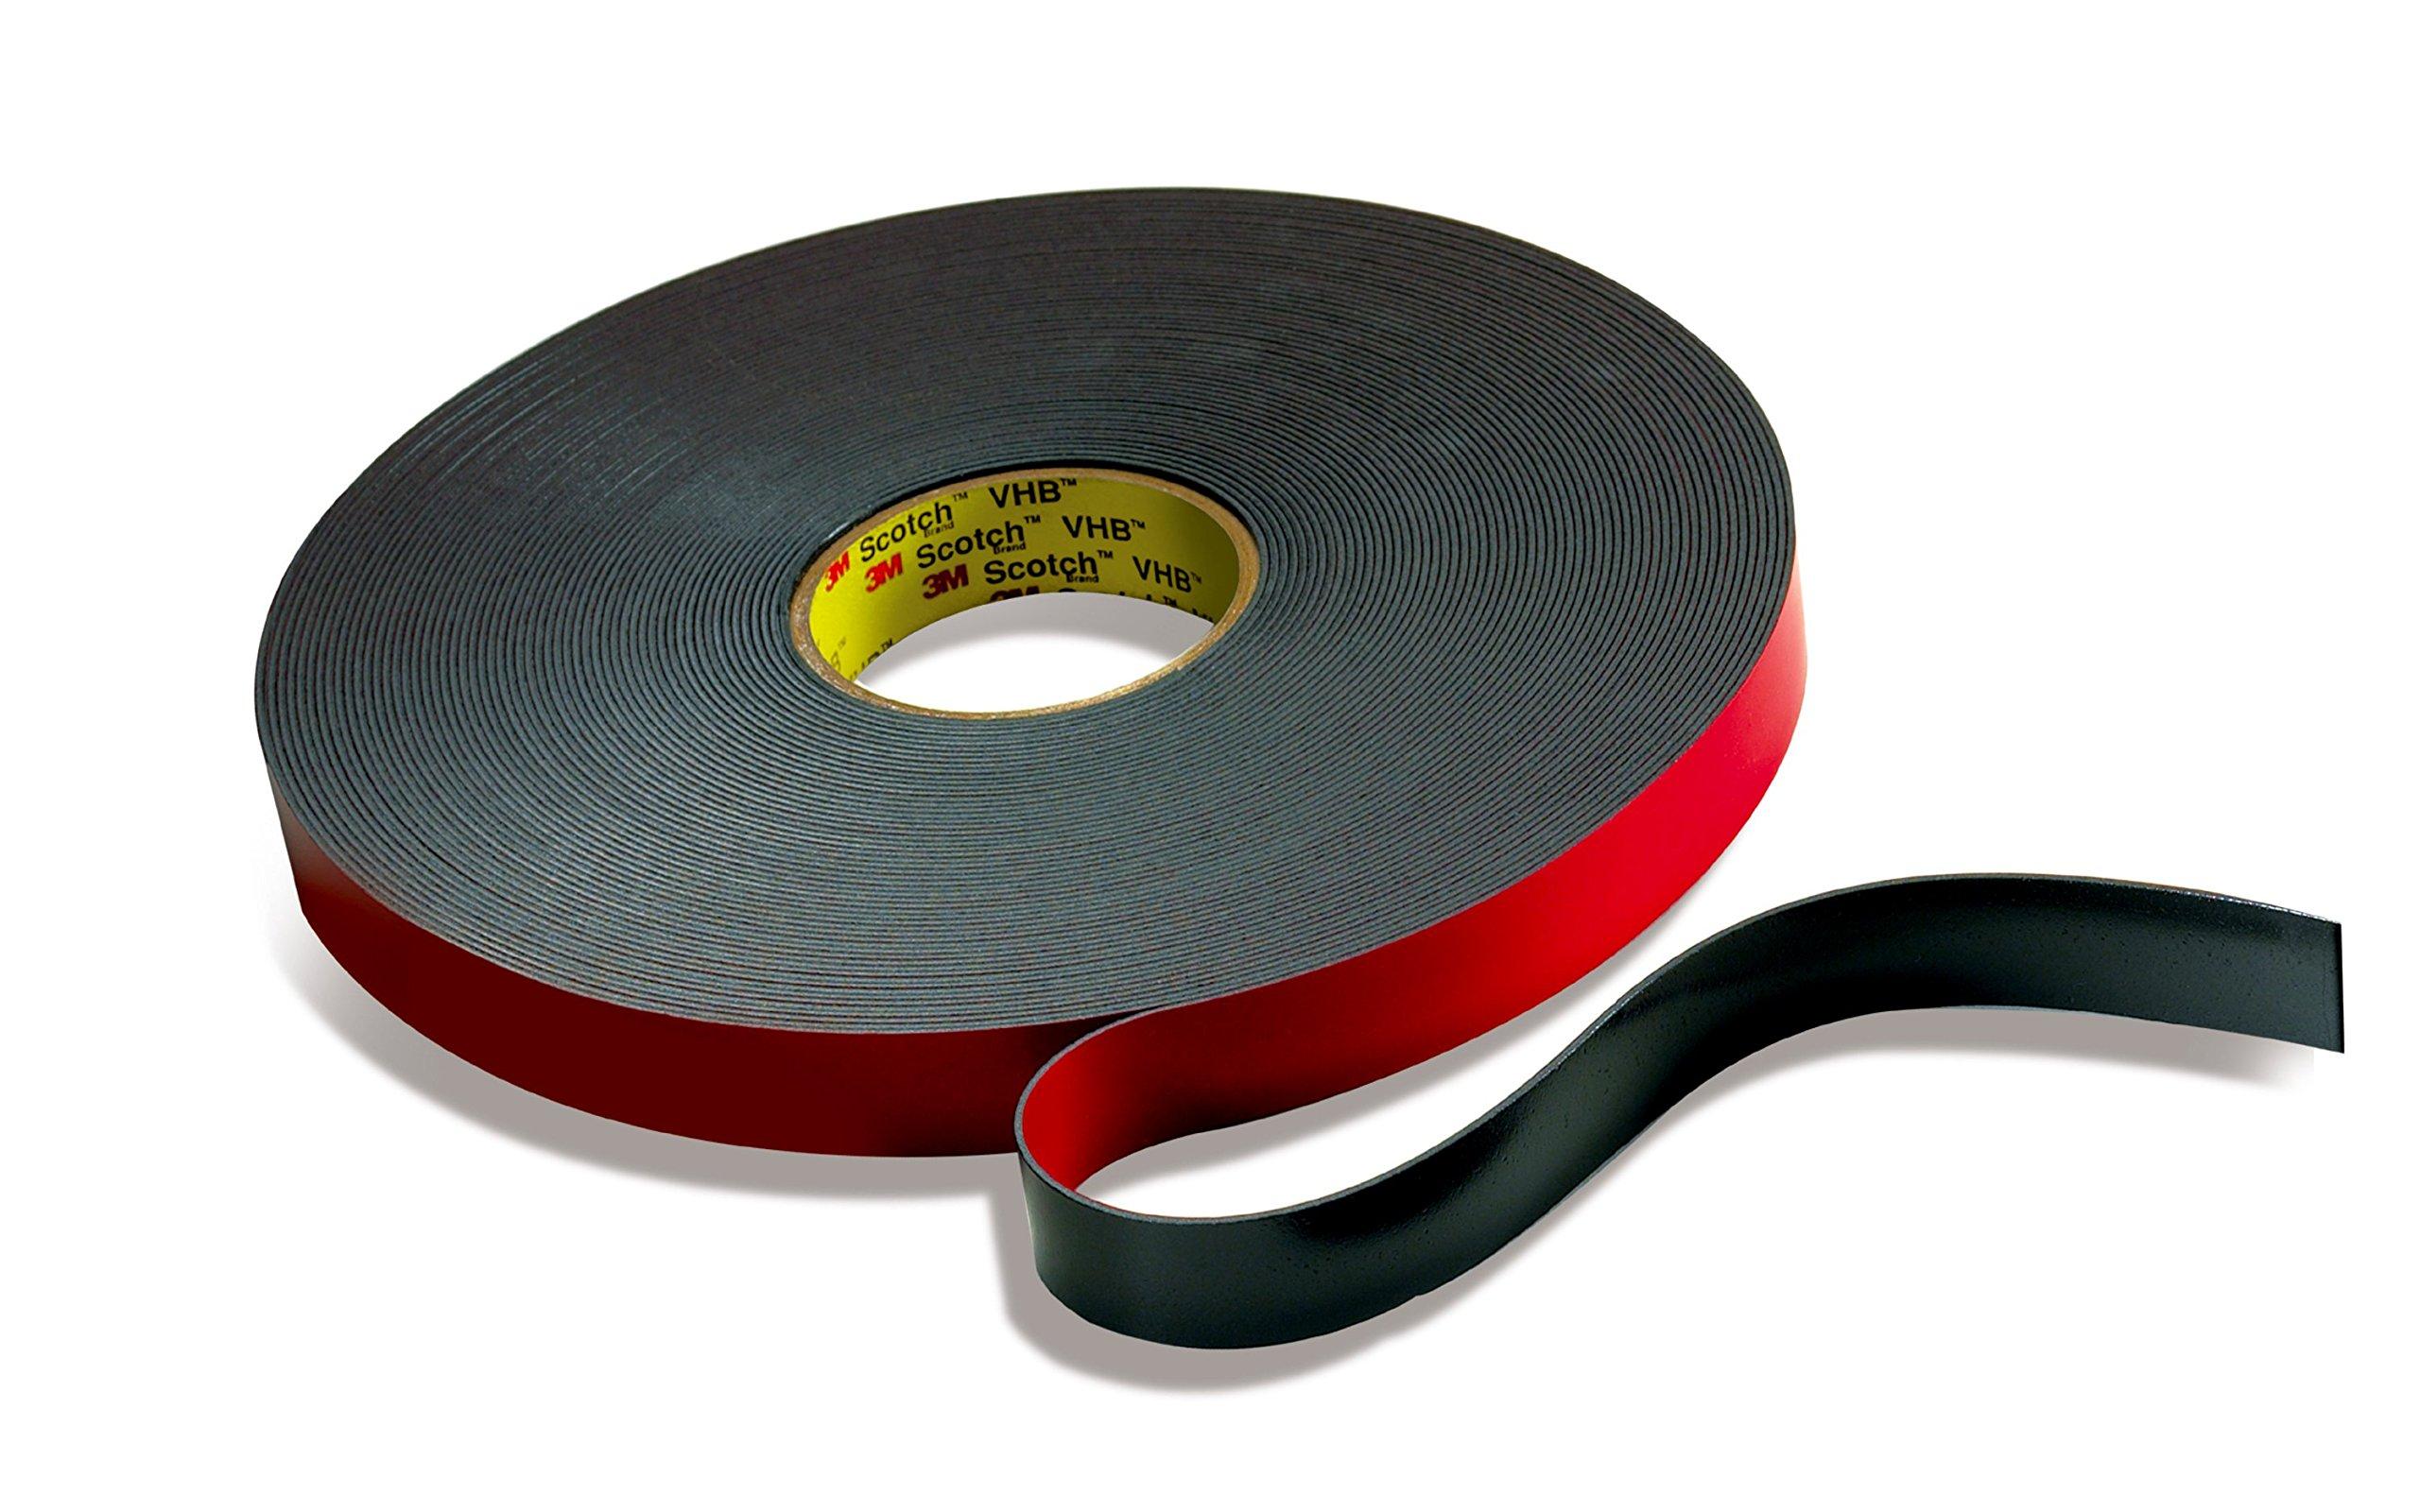 3M VHB 68024-case Tape Levelwound, 45 mil, 3/8 in x